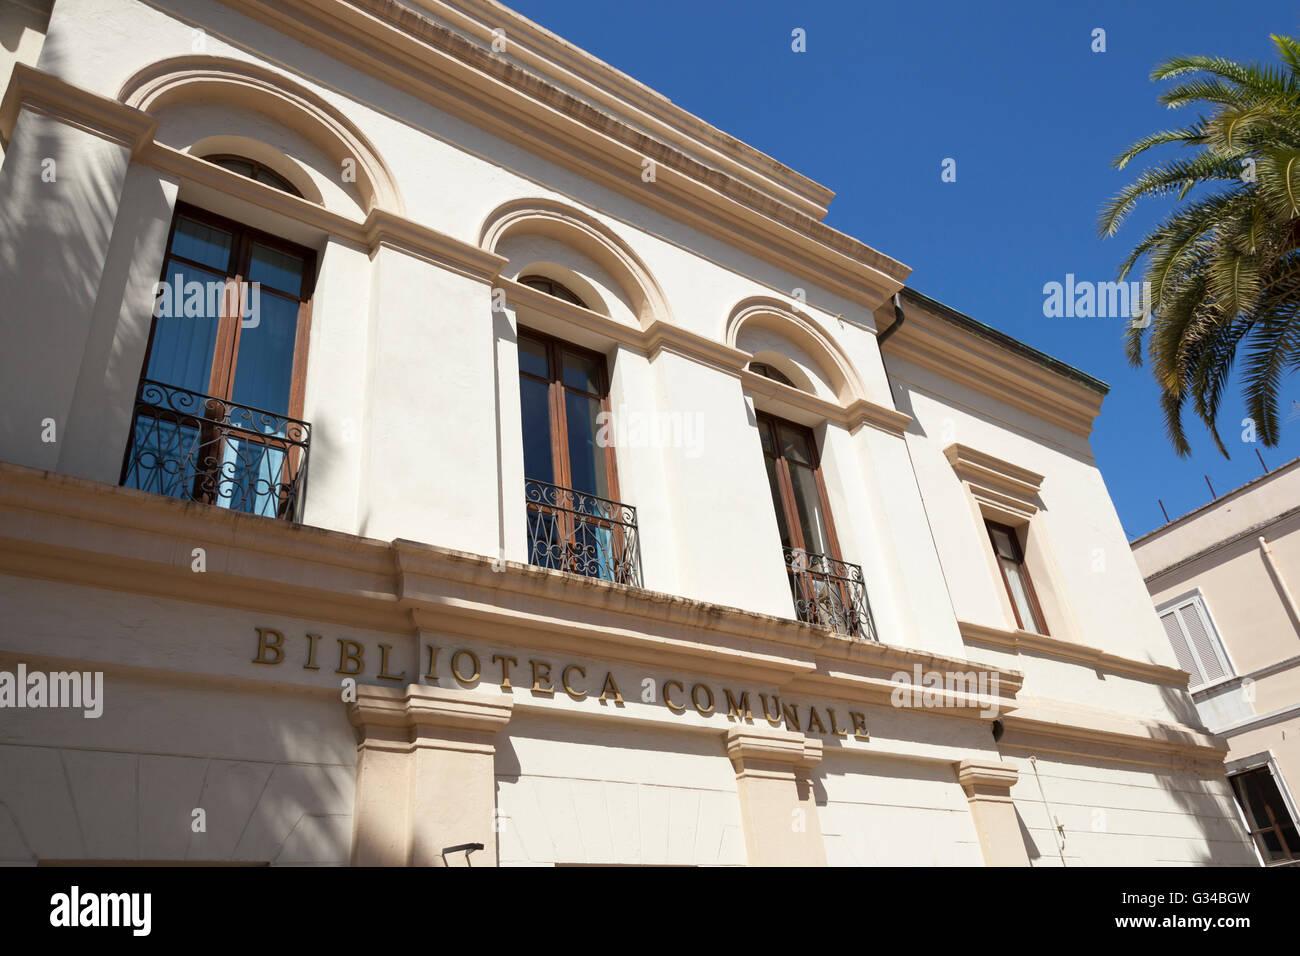 Biblioteca Comunale, Municipal Library, Olbia, Sardinia, Italy - Stock Image